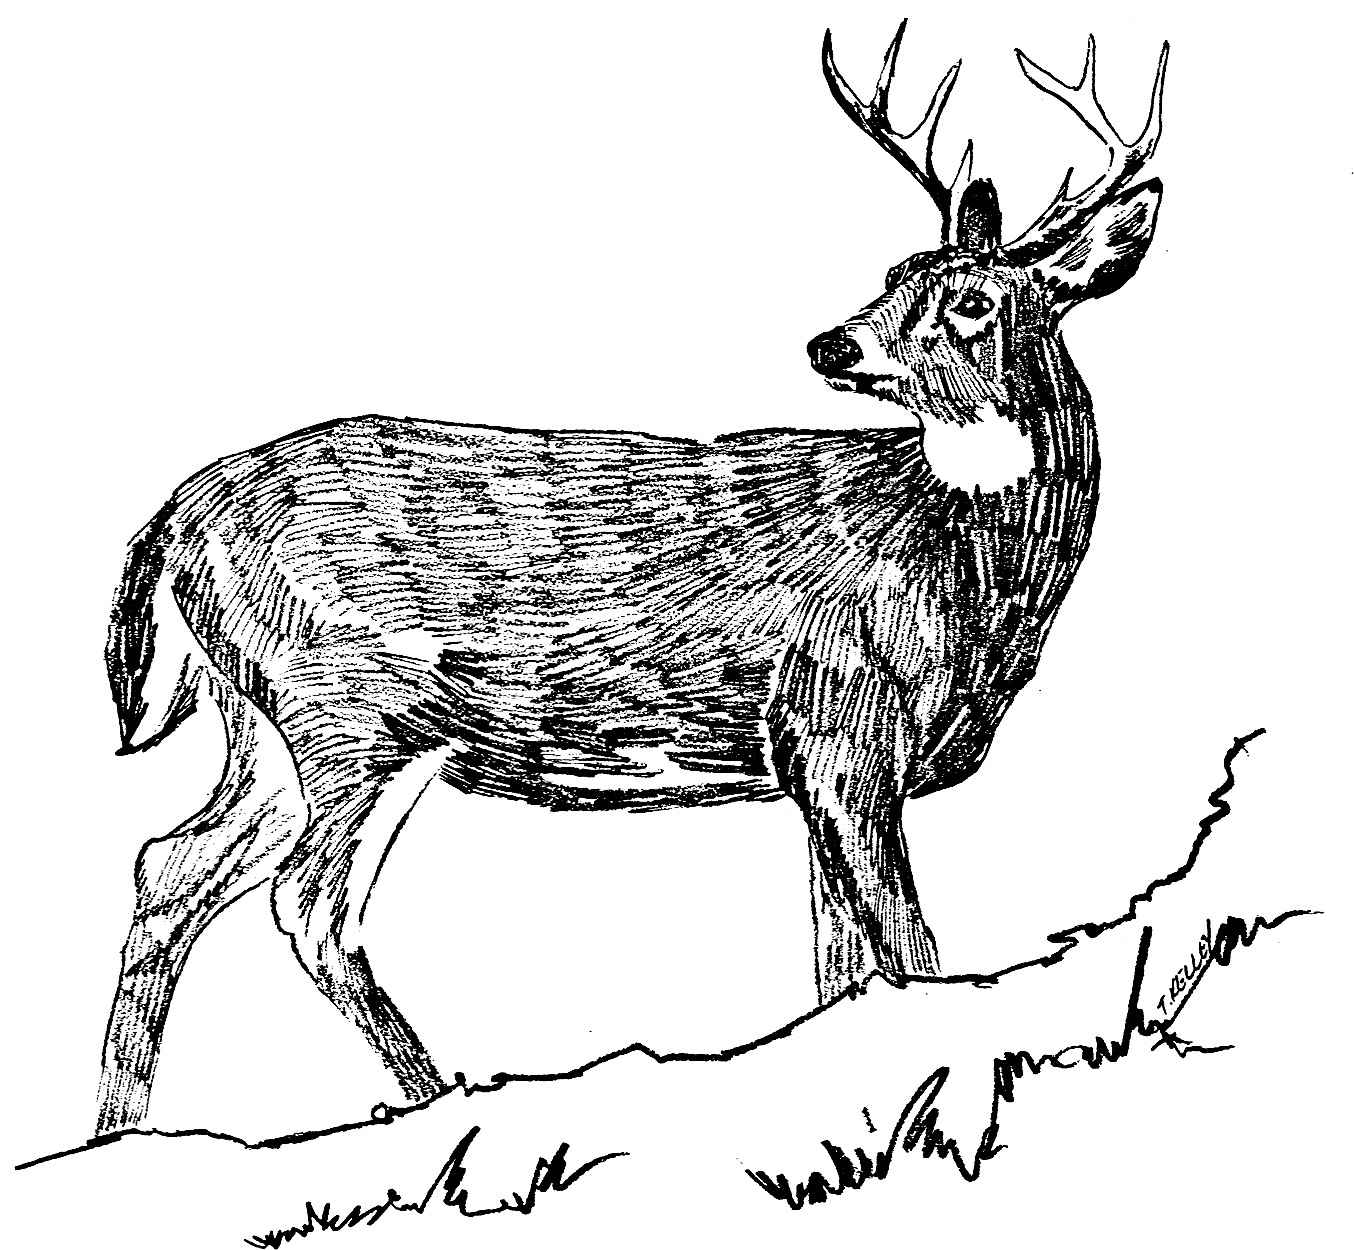 Deer illustration black and white - photo#9